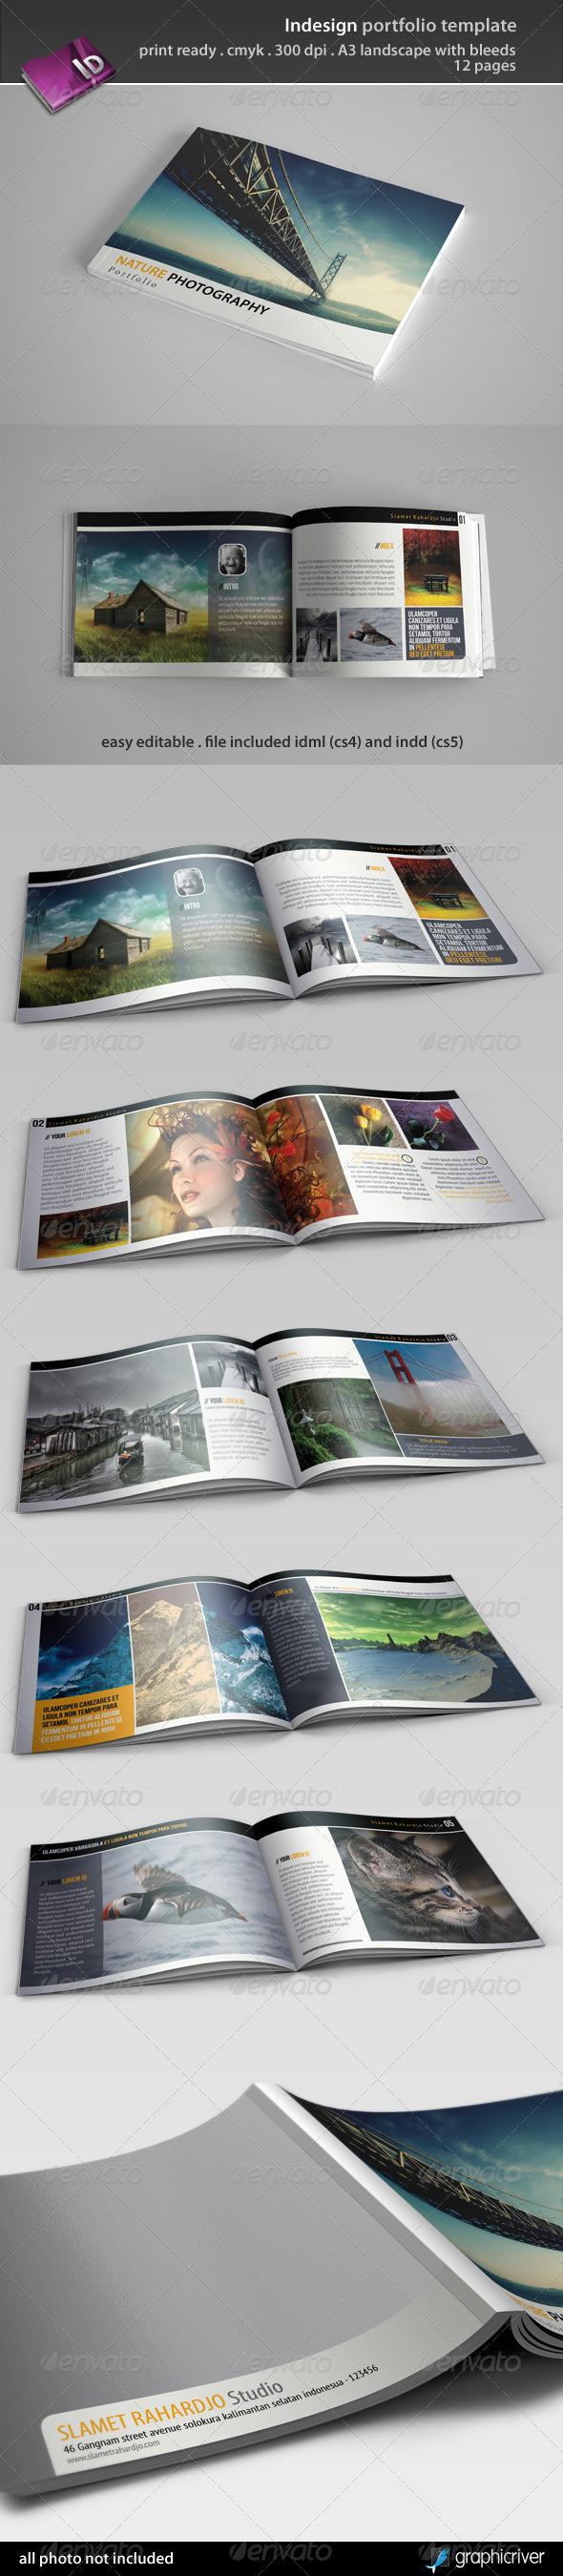 GraphicRiver Indesign Portfolio Template 3435643